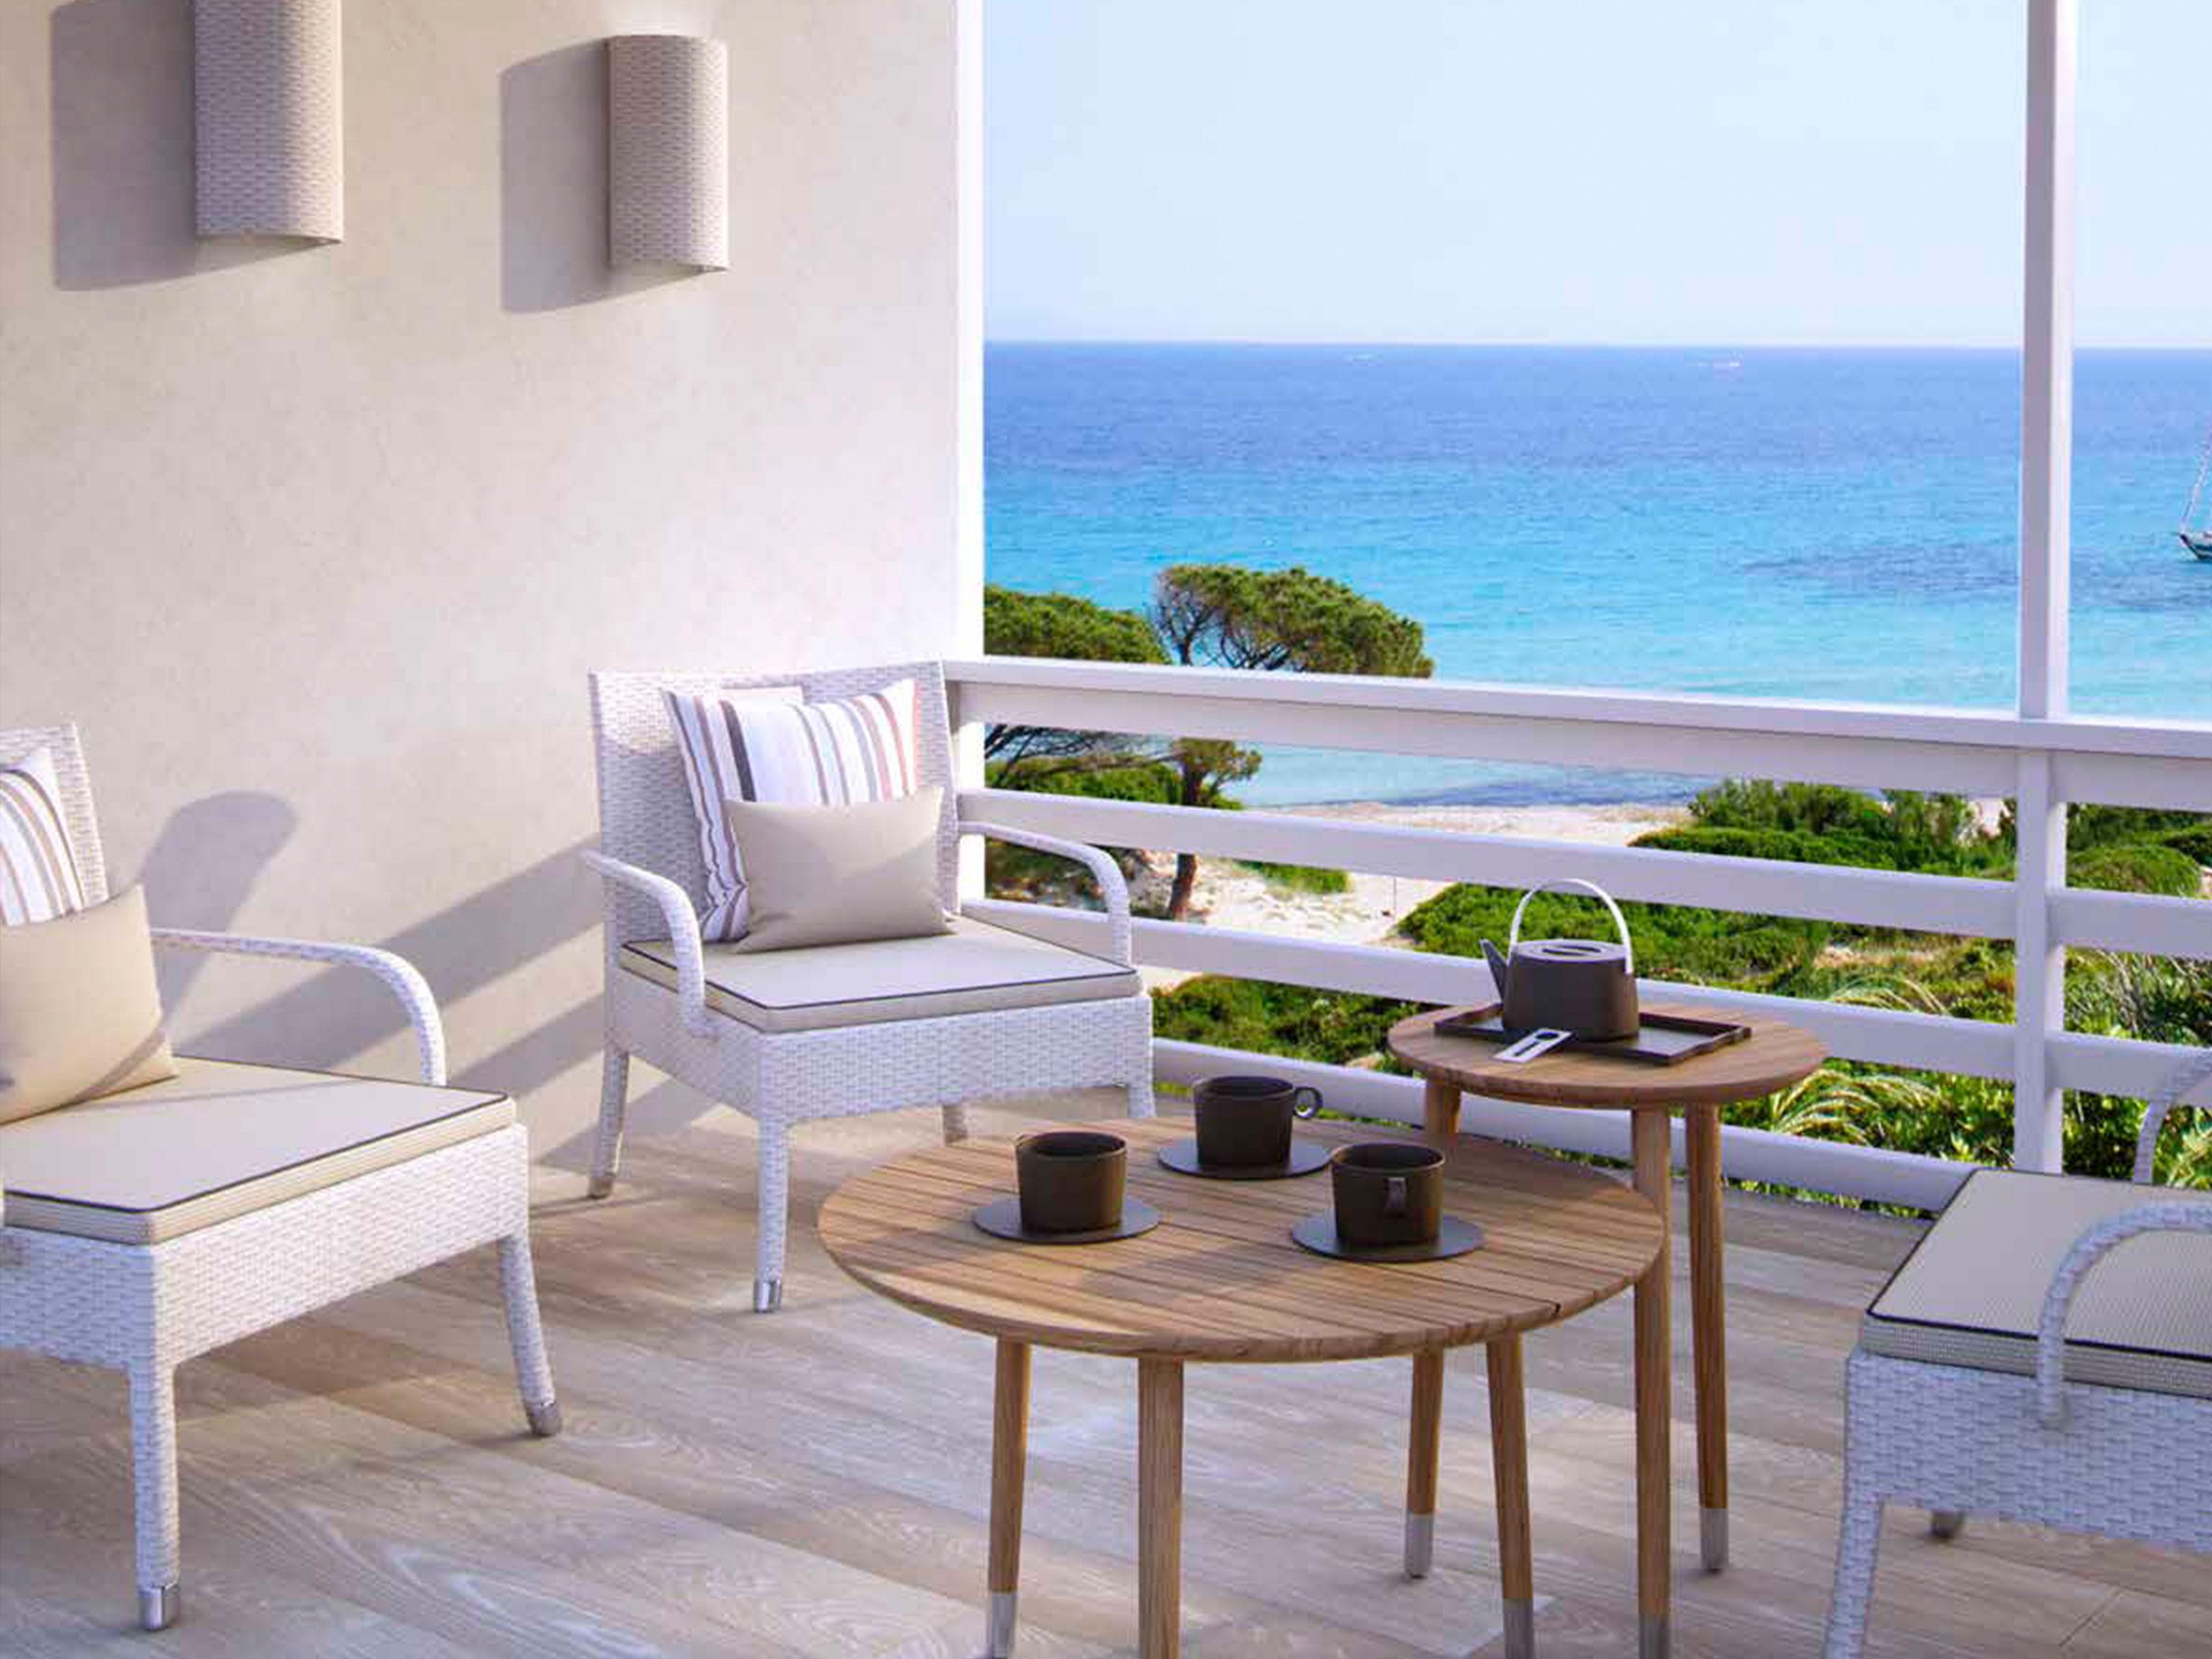 Home Modular Furniture